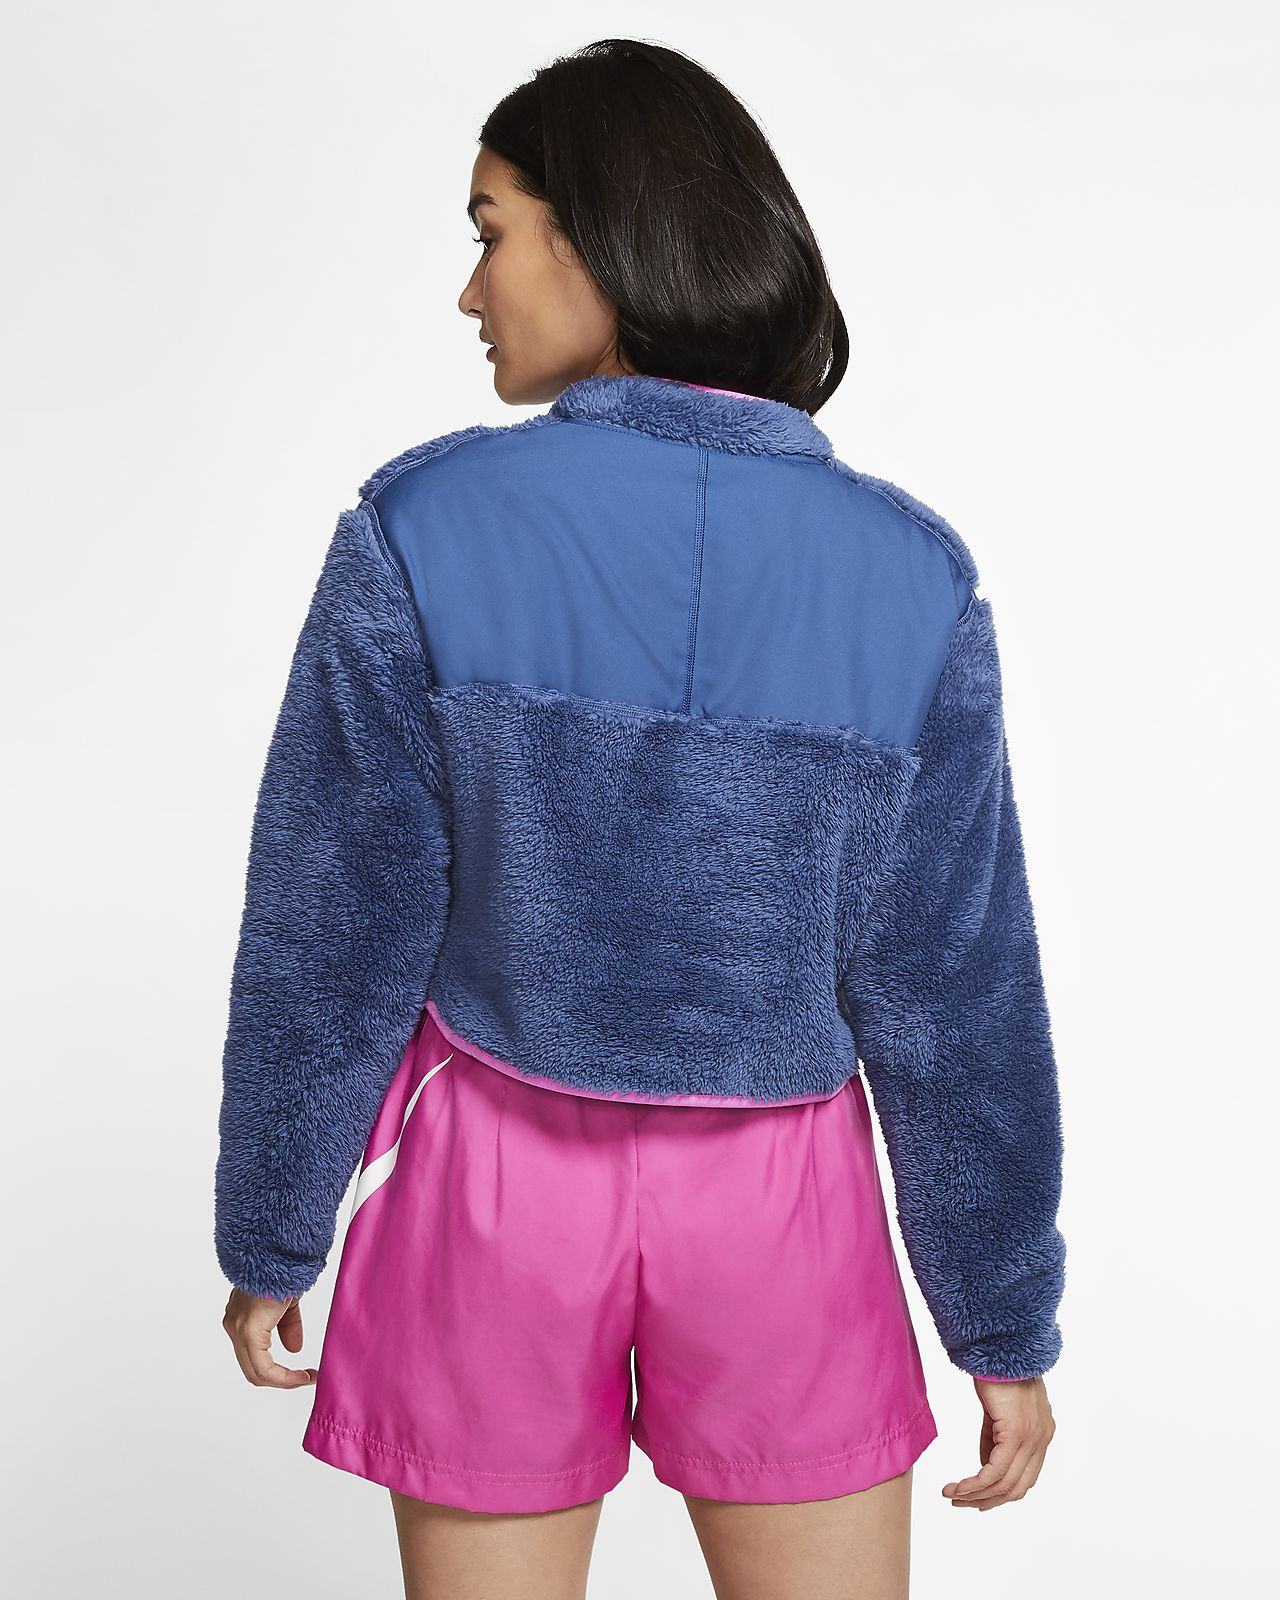 nike 1/4 zip fleece womens